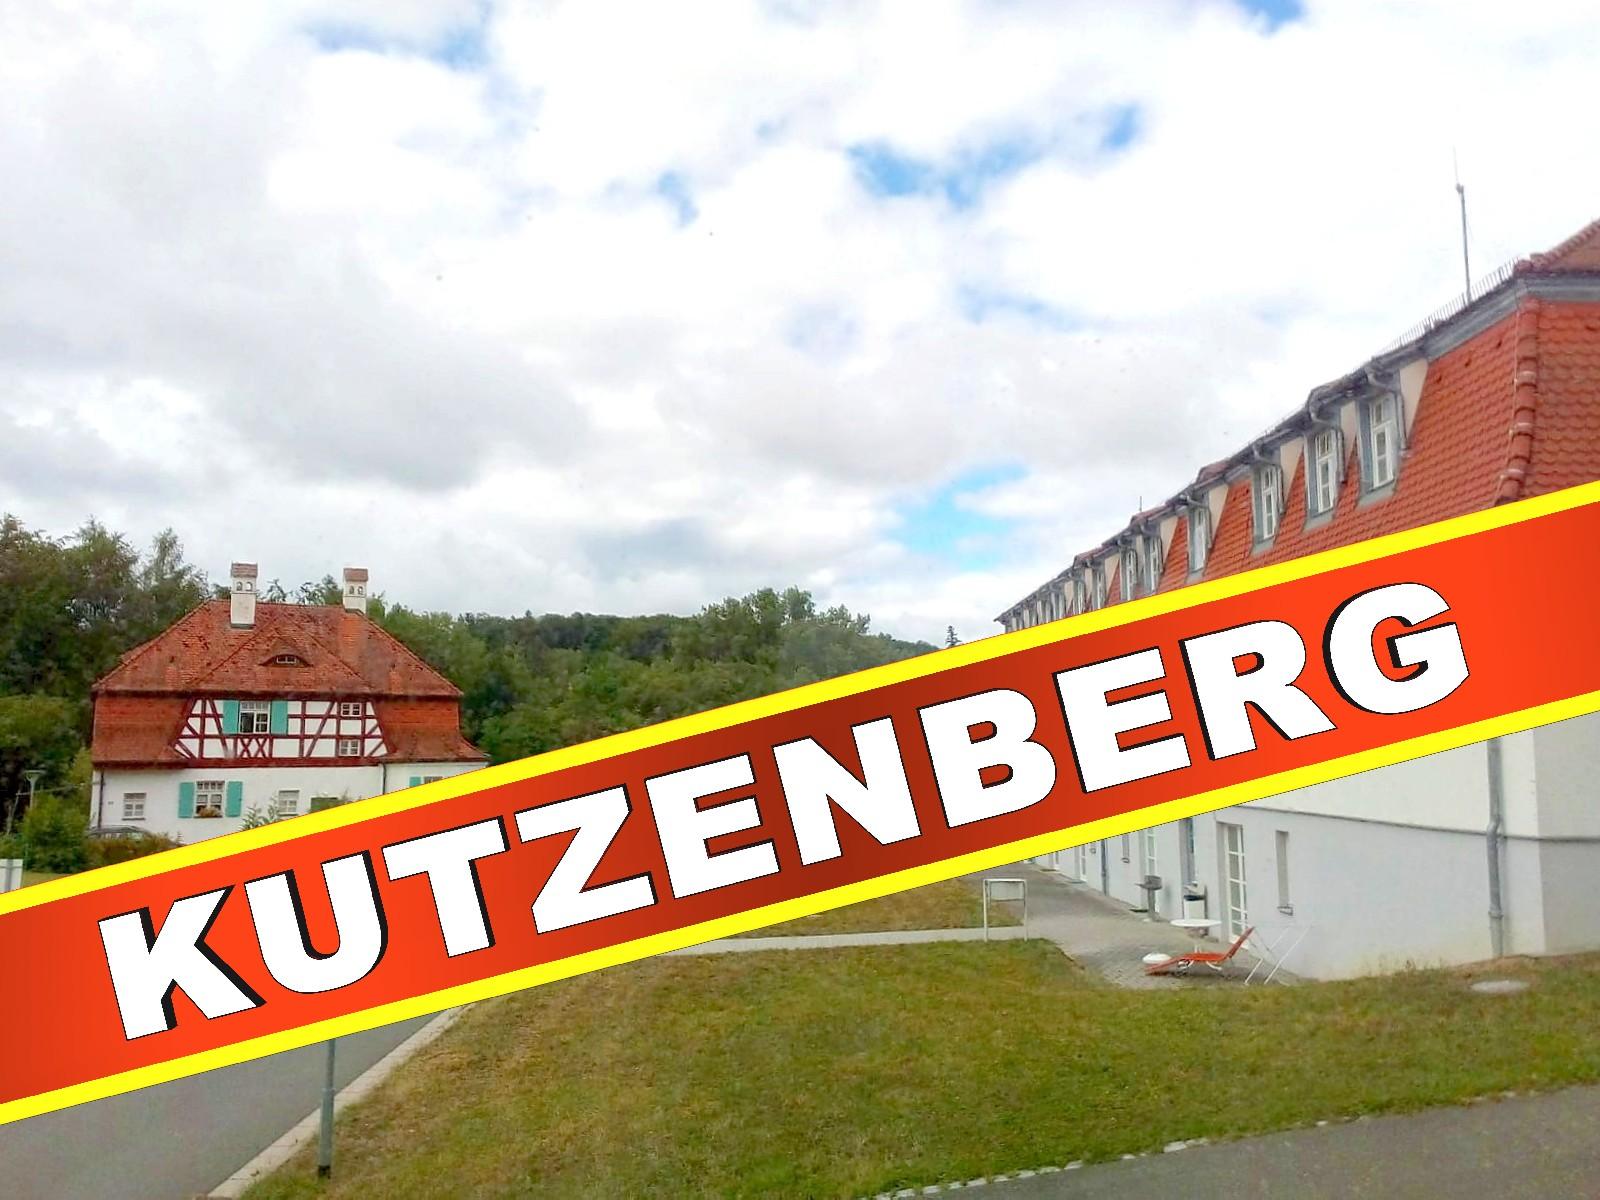 Bezirksklinikum Obermain Kutzenberg, 96250 Ebensfeld Psychiatrie Polizei Krankenhaus (41)